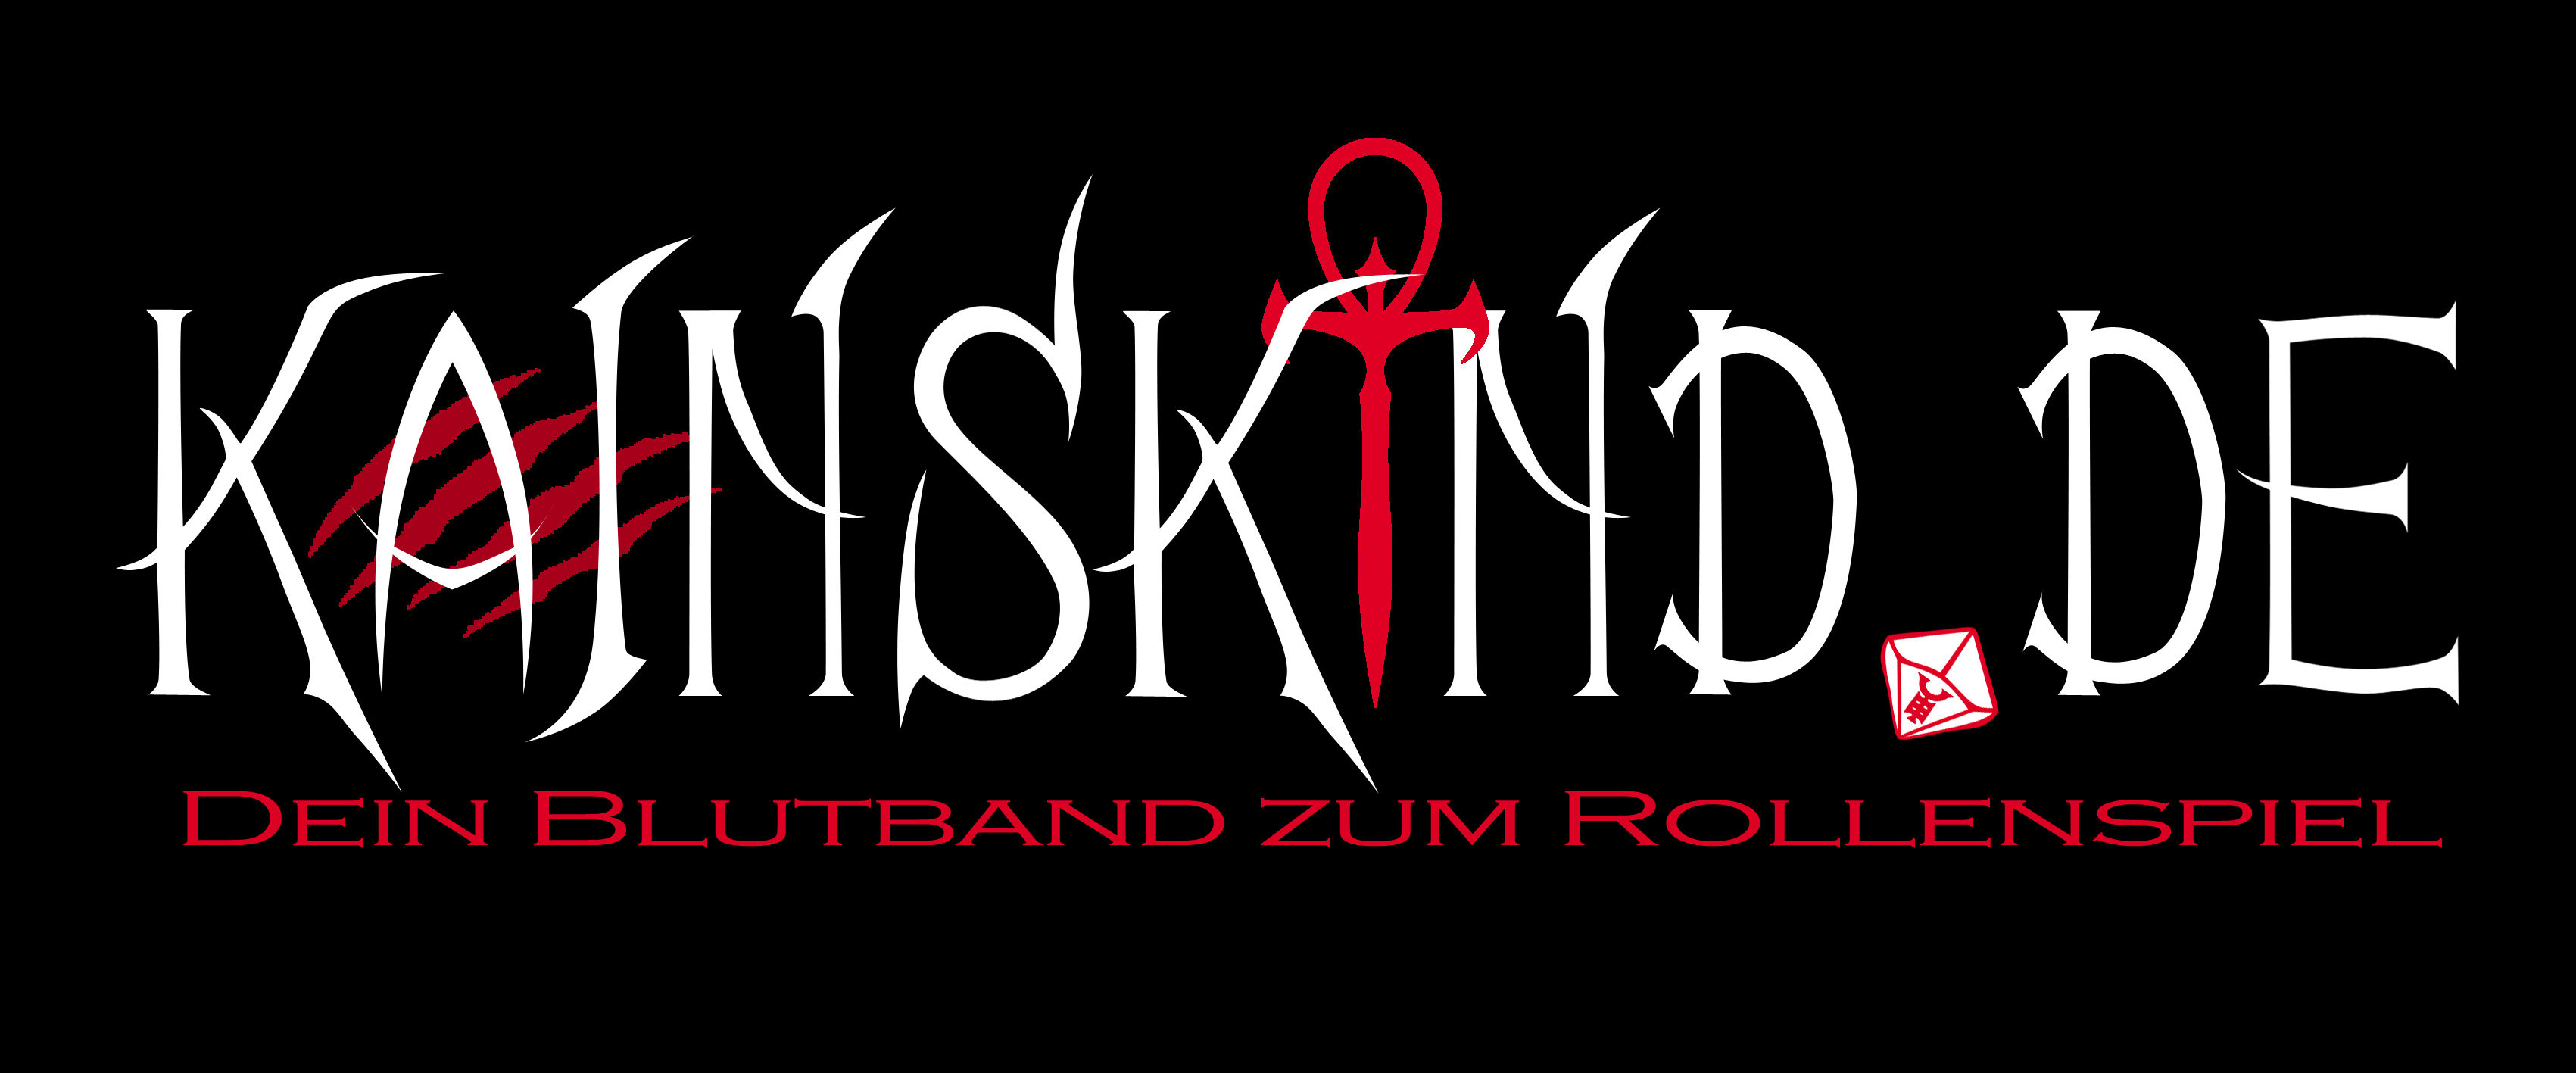 Kainskind